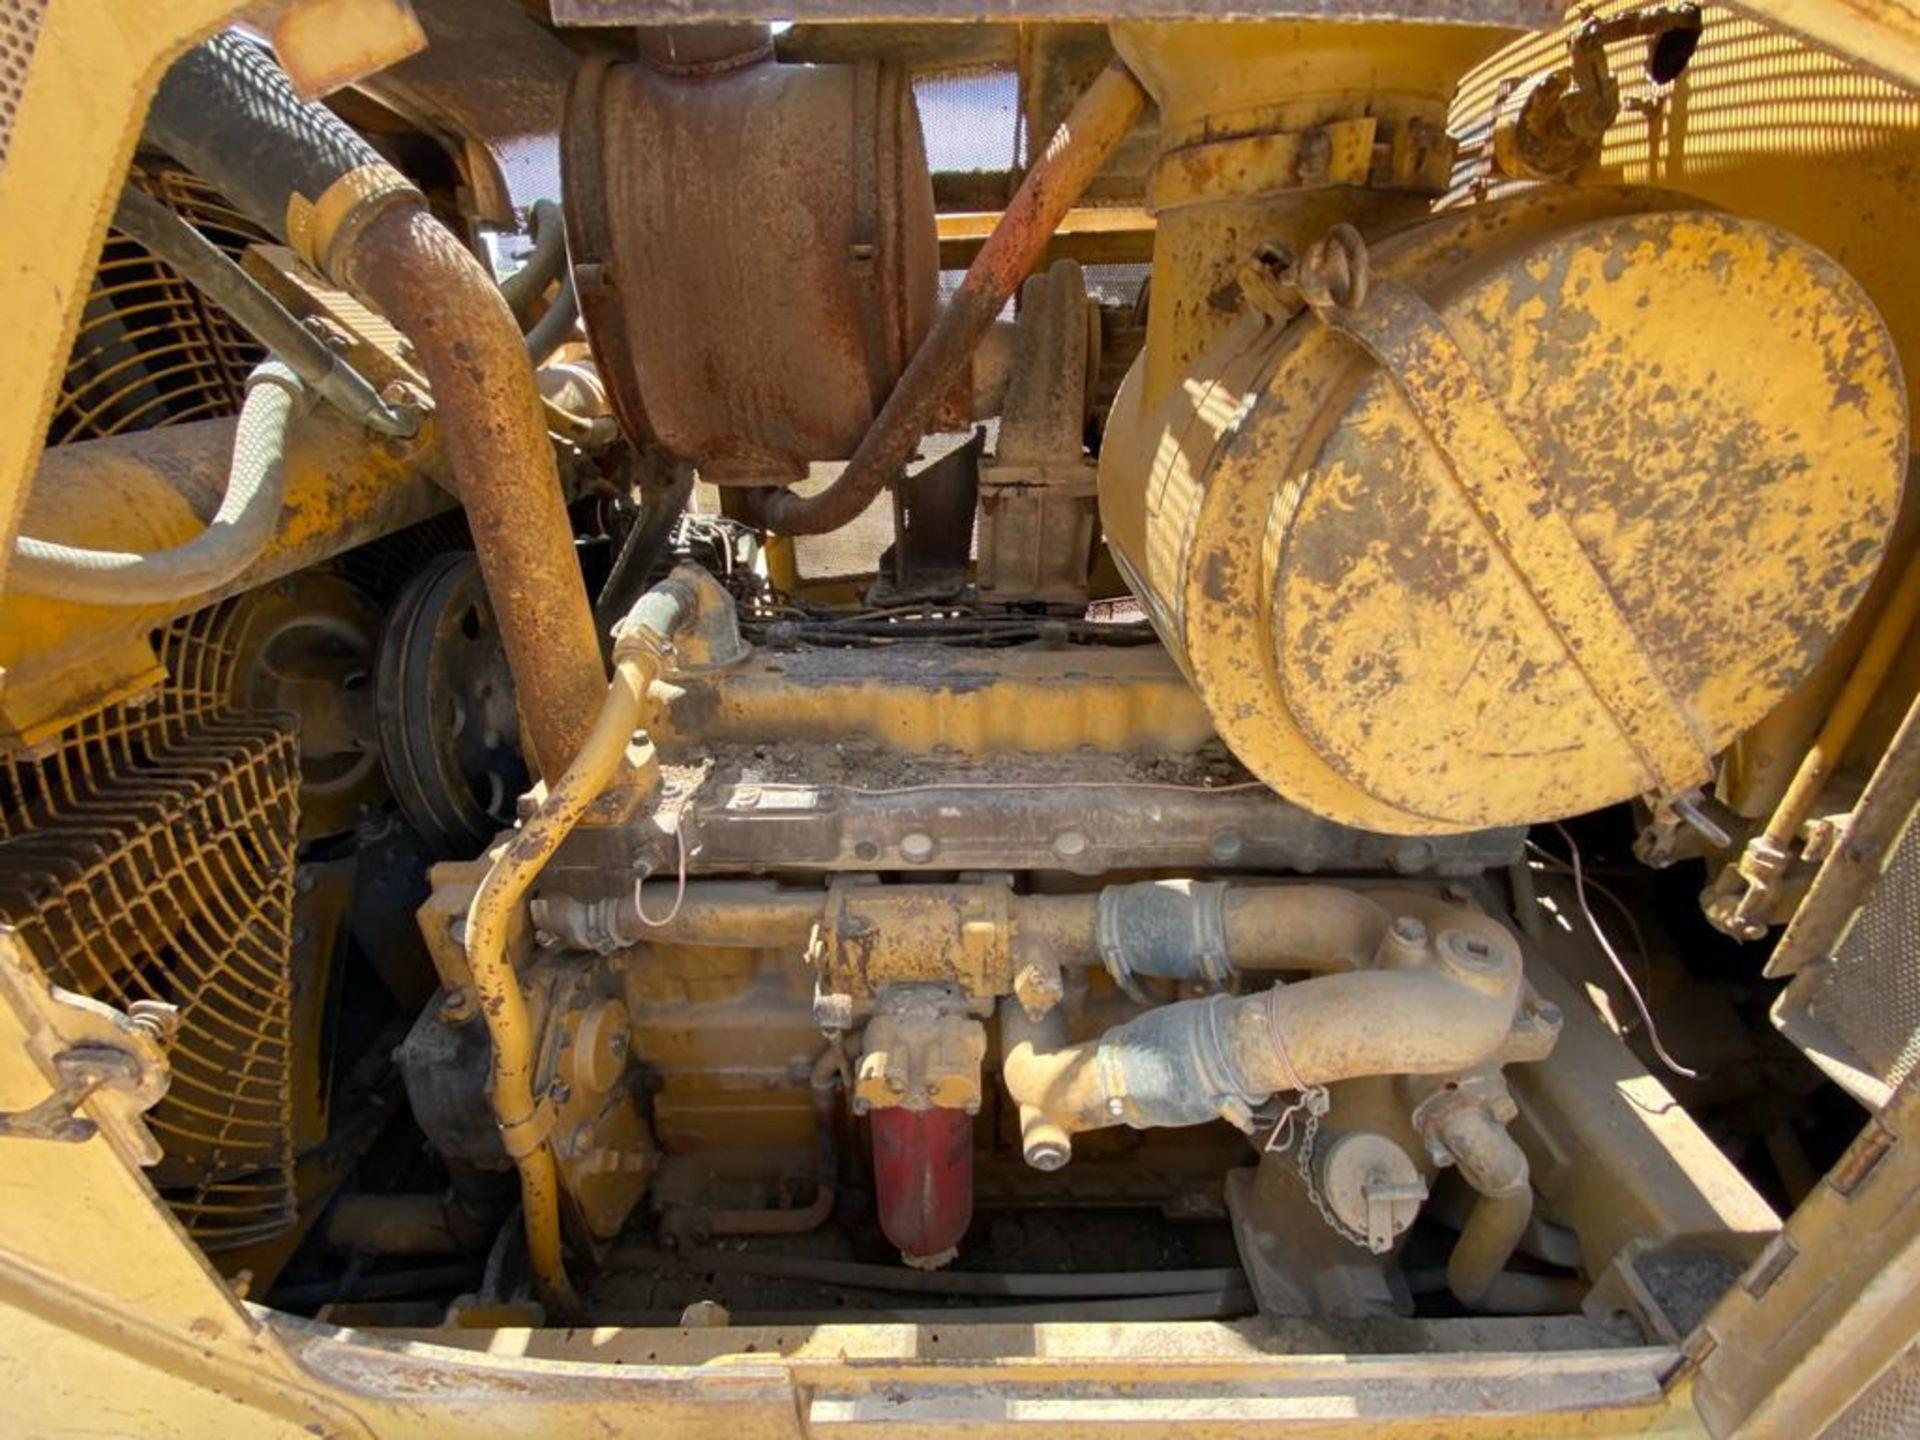 Caterpillar D7G Bulldozer, Serial number 92V5897, Diesel motor - Image 31 of 48